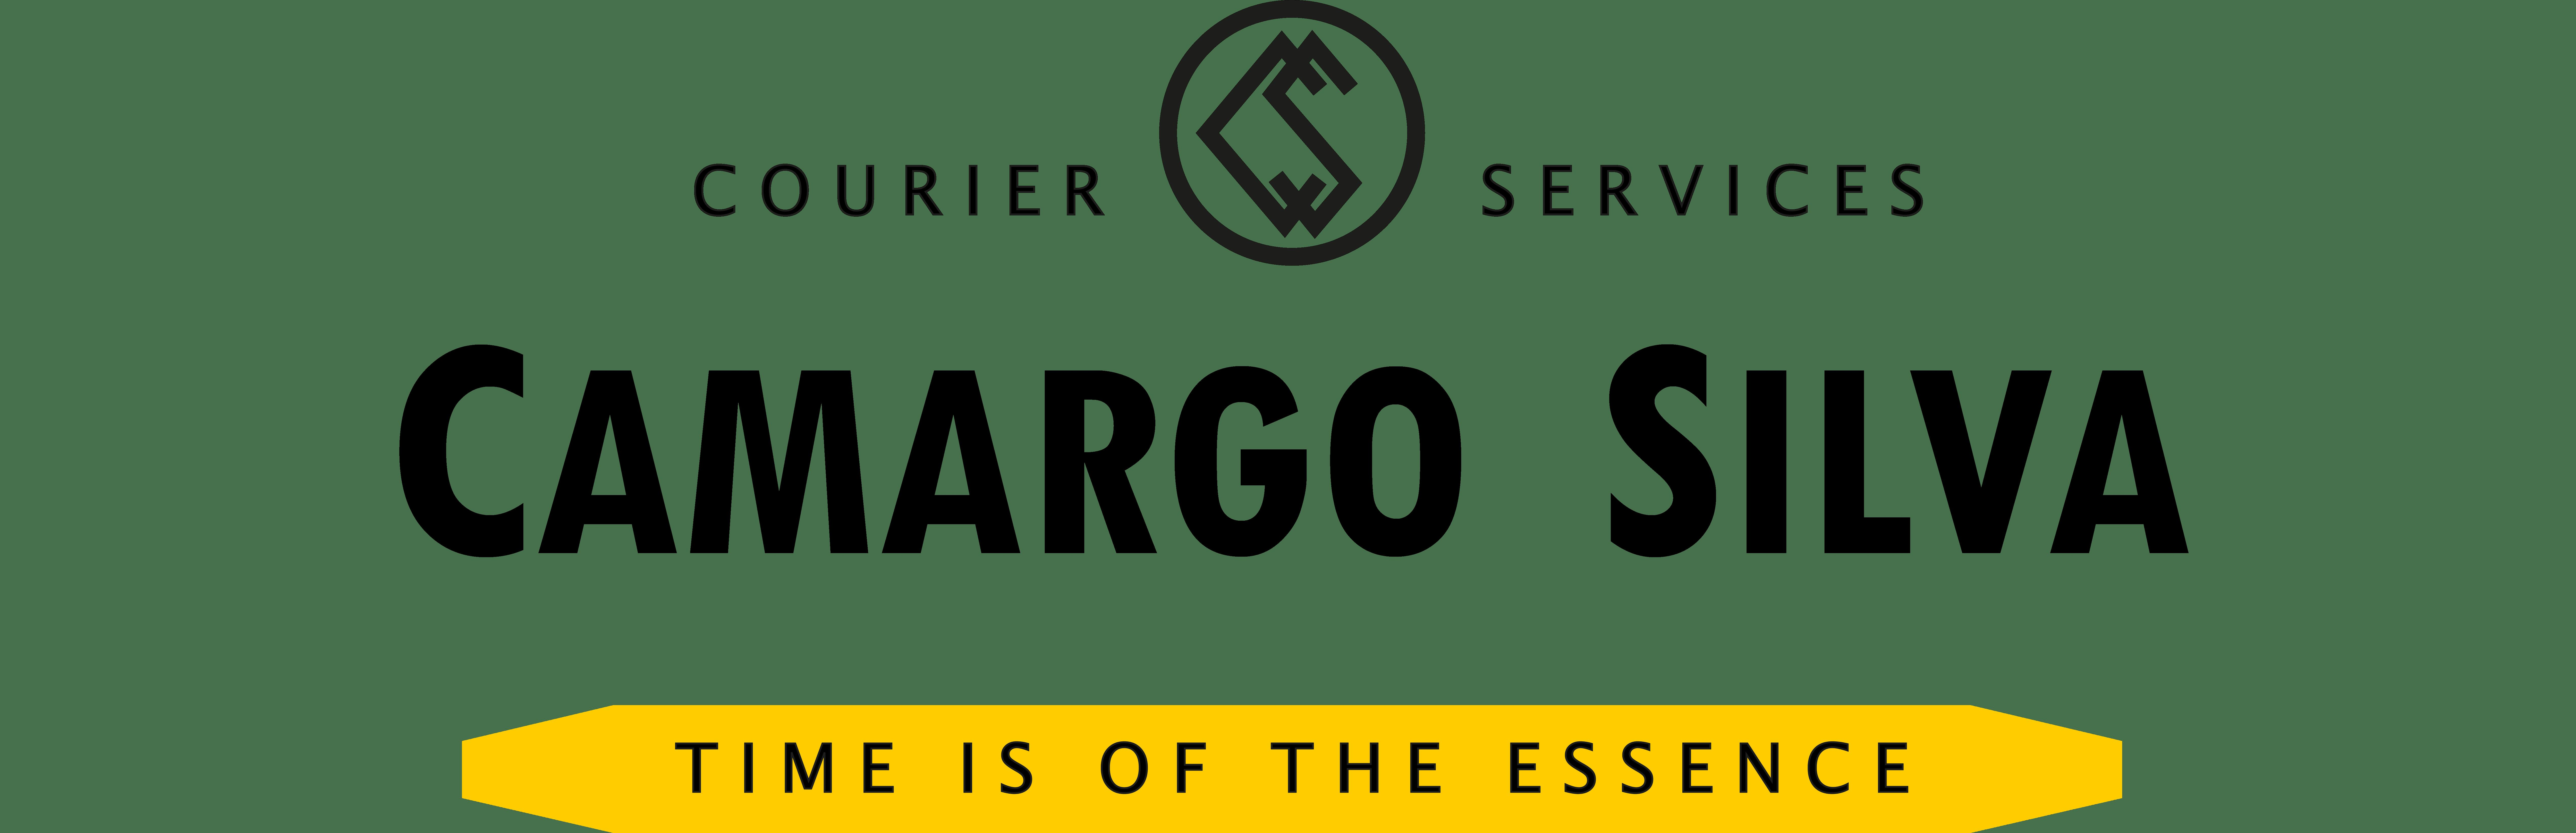 CAMARGO SILVA COURIER SERVICES LTD